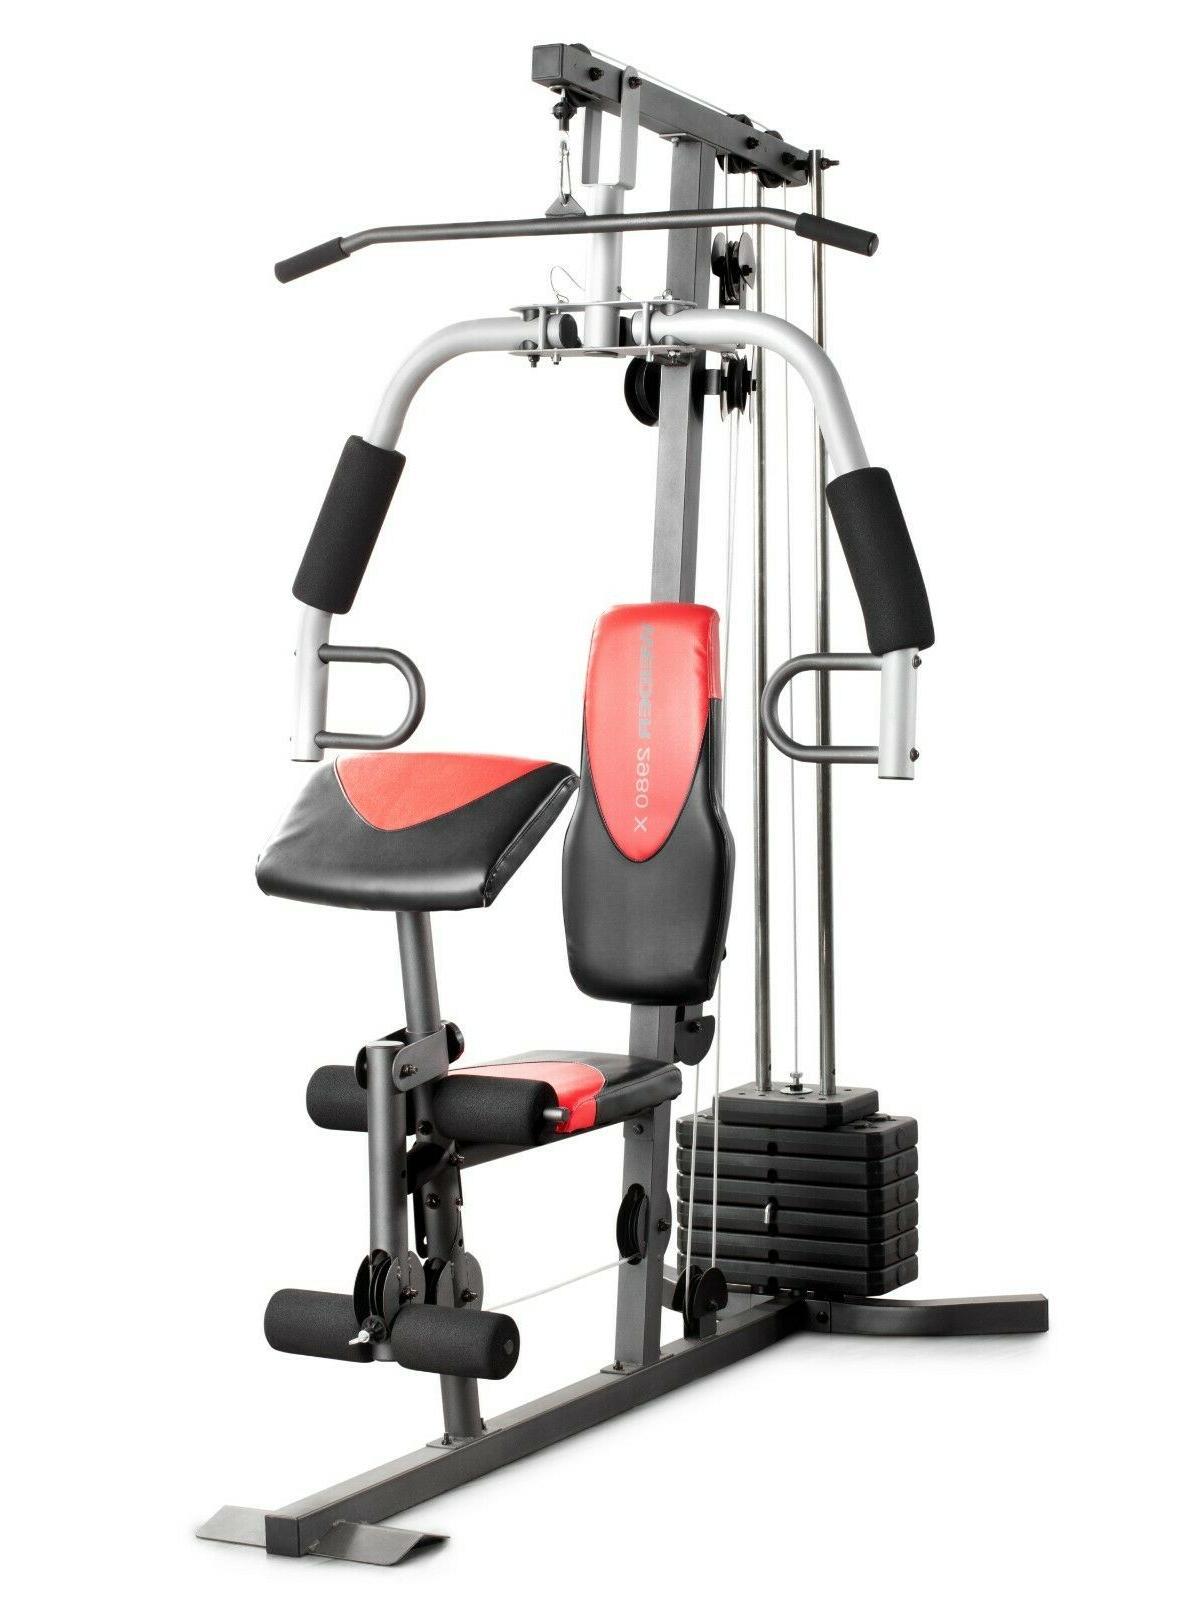 Weider Gym System Leg Pad Workout